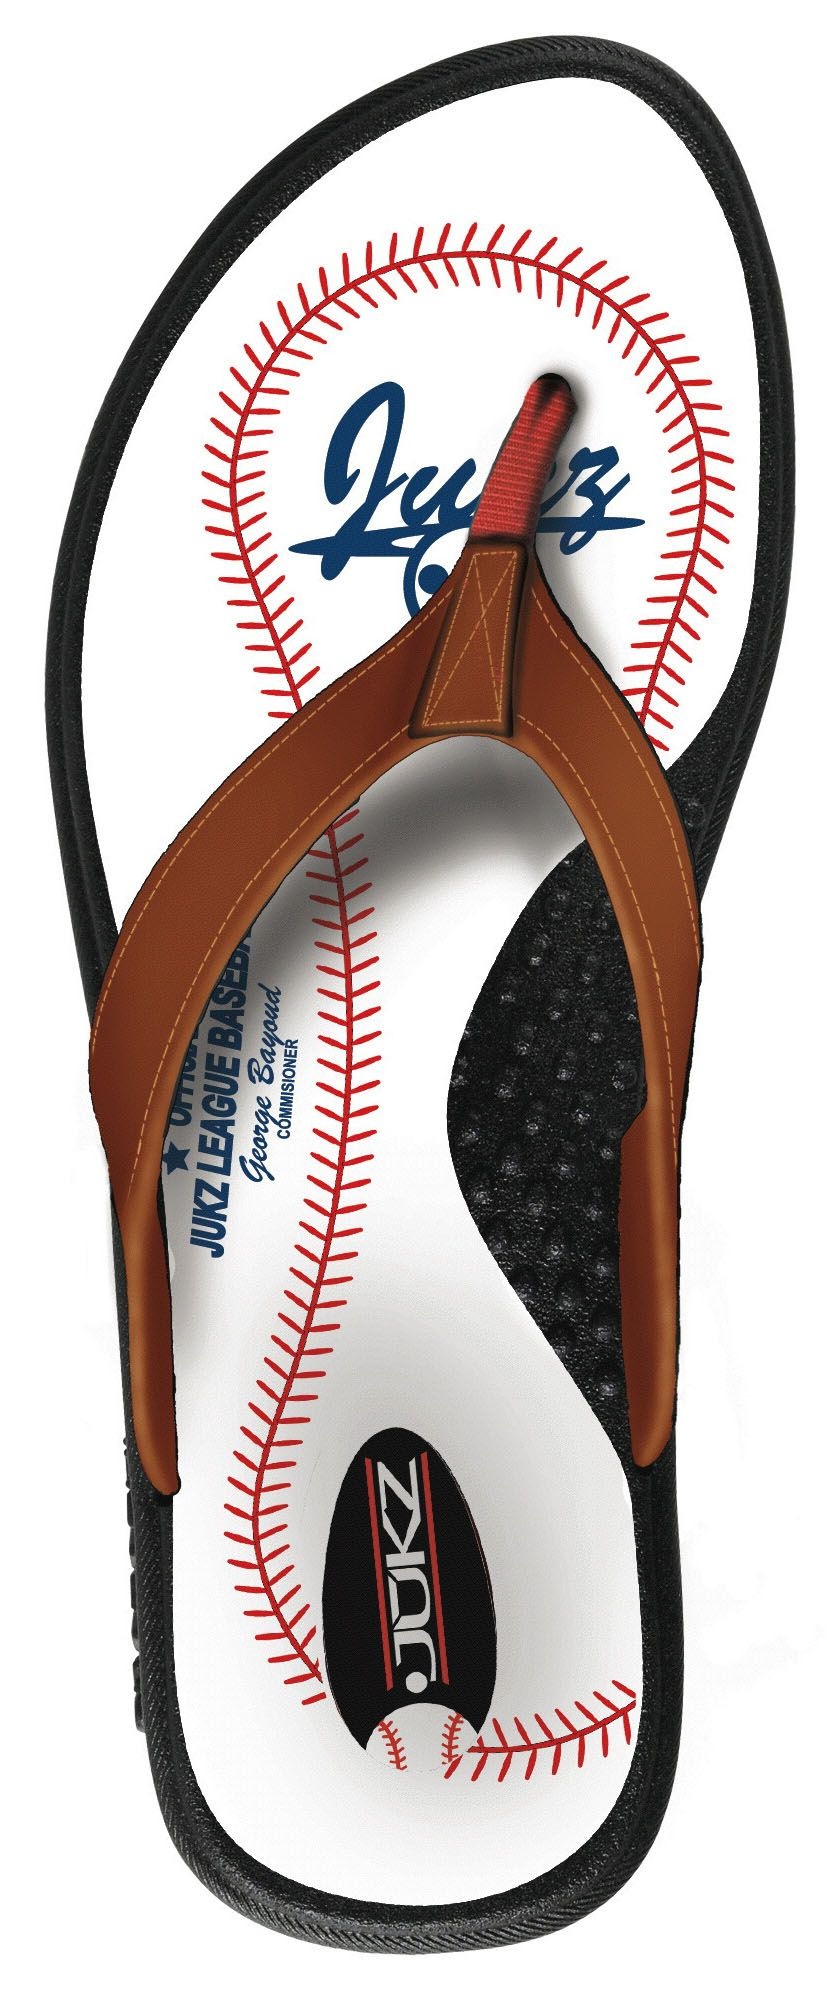 7a866c11ca5f Baseball Flip Flops   Baseball Sandals   Baseball Shoes from Jukz Shoes!